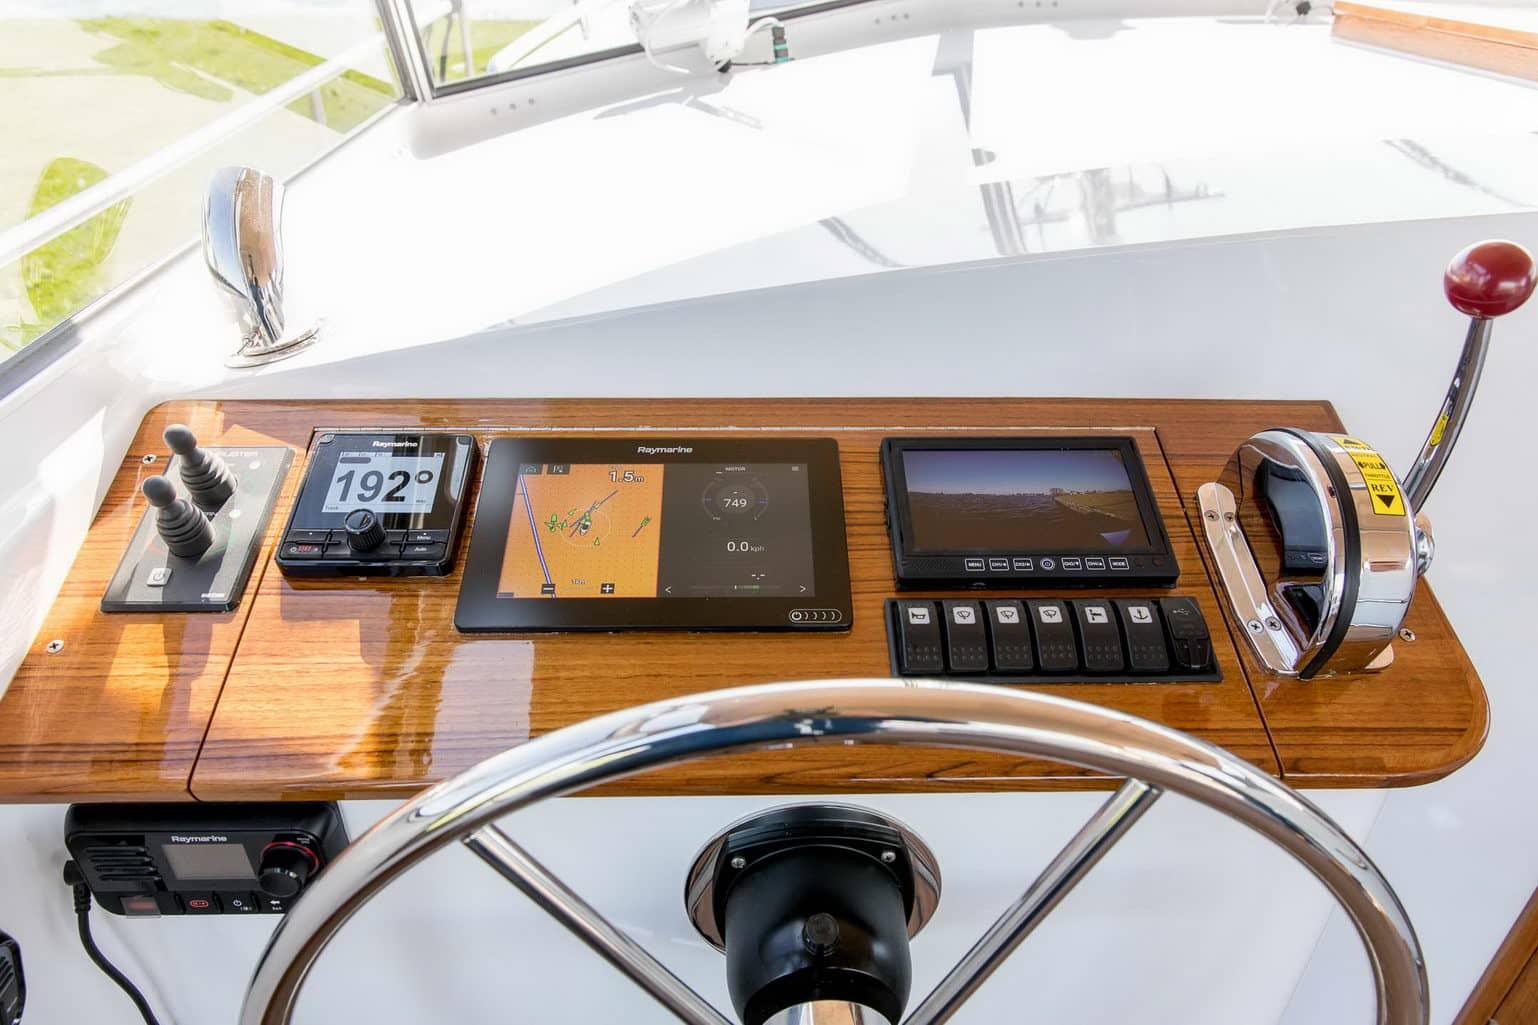 varen dashboard teak boegschroef hekschroef raymarine autopilot plotter camera marifoon open kuip Langenberg Cabin Cruiser LCC 33 Overwijk Yachting